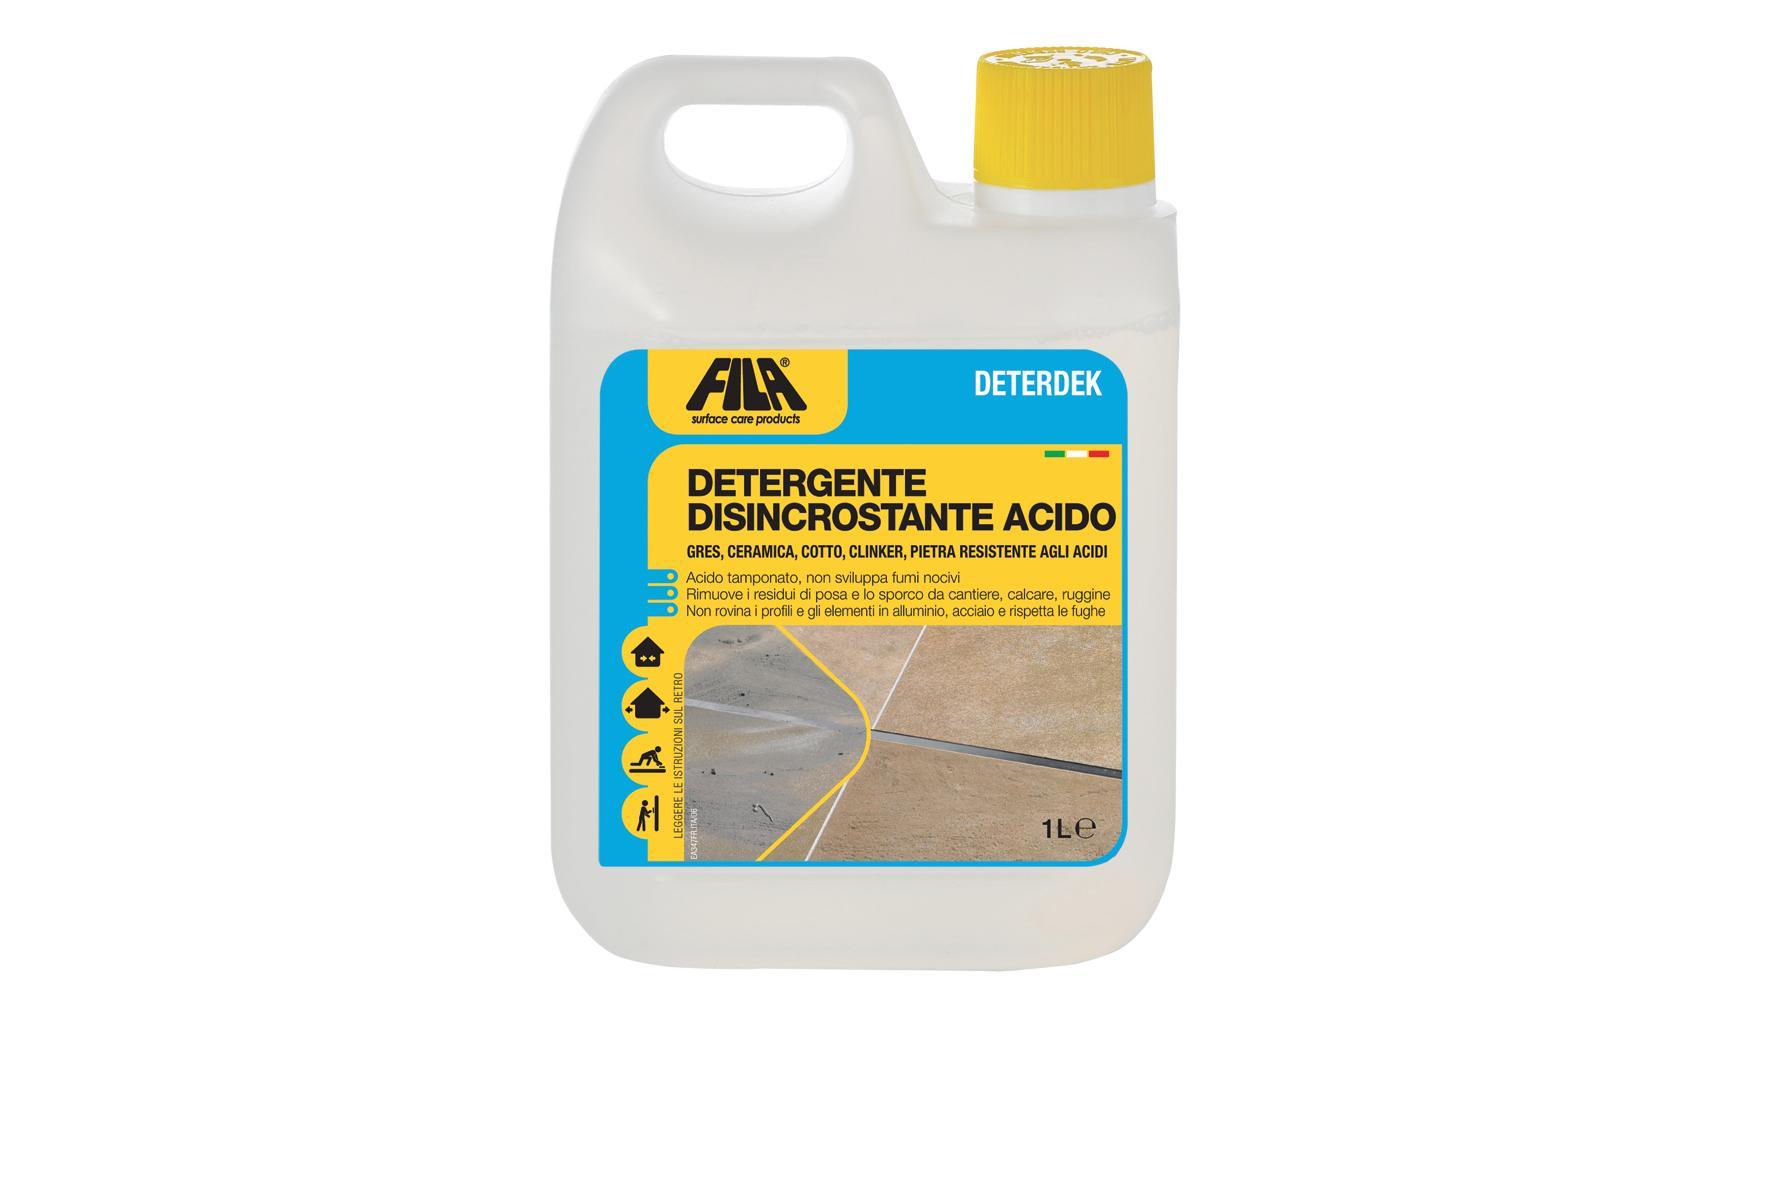 Detergente Per Cotto Esterno detergente disincrostante acido deterdek